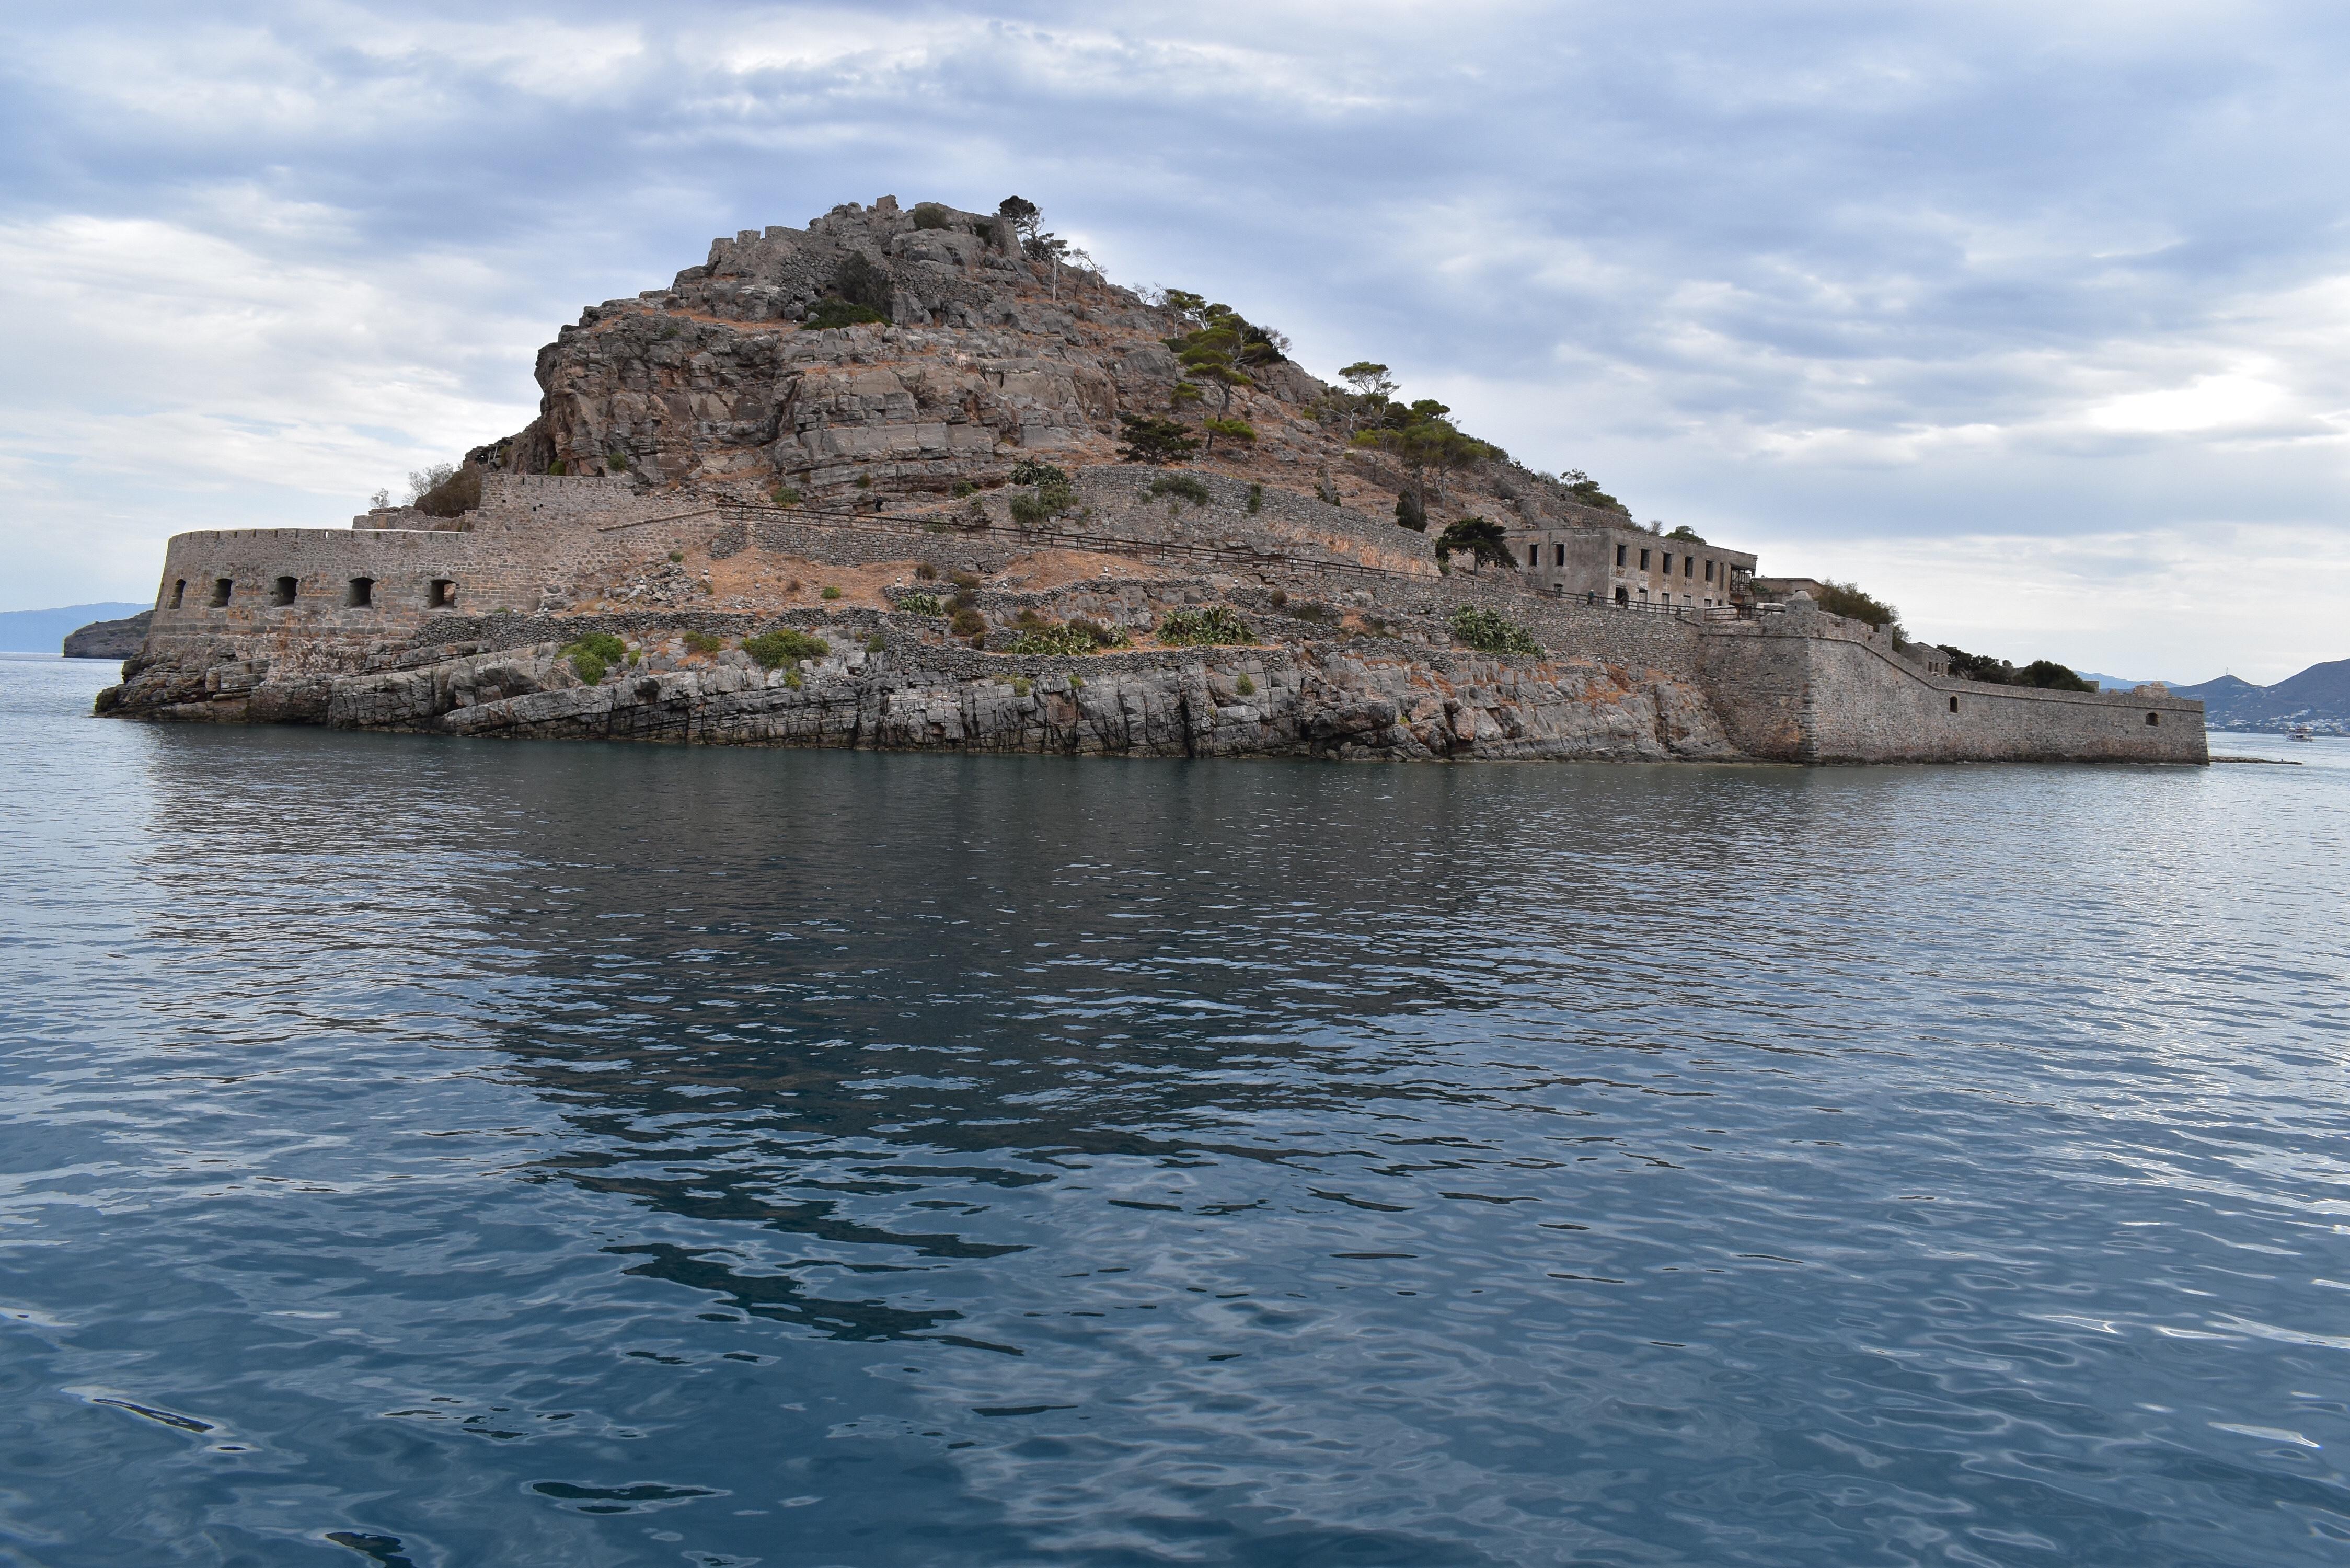 Leprainsel Spinalonga vom Meer aus